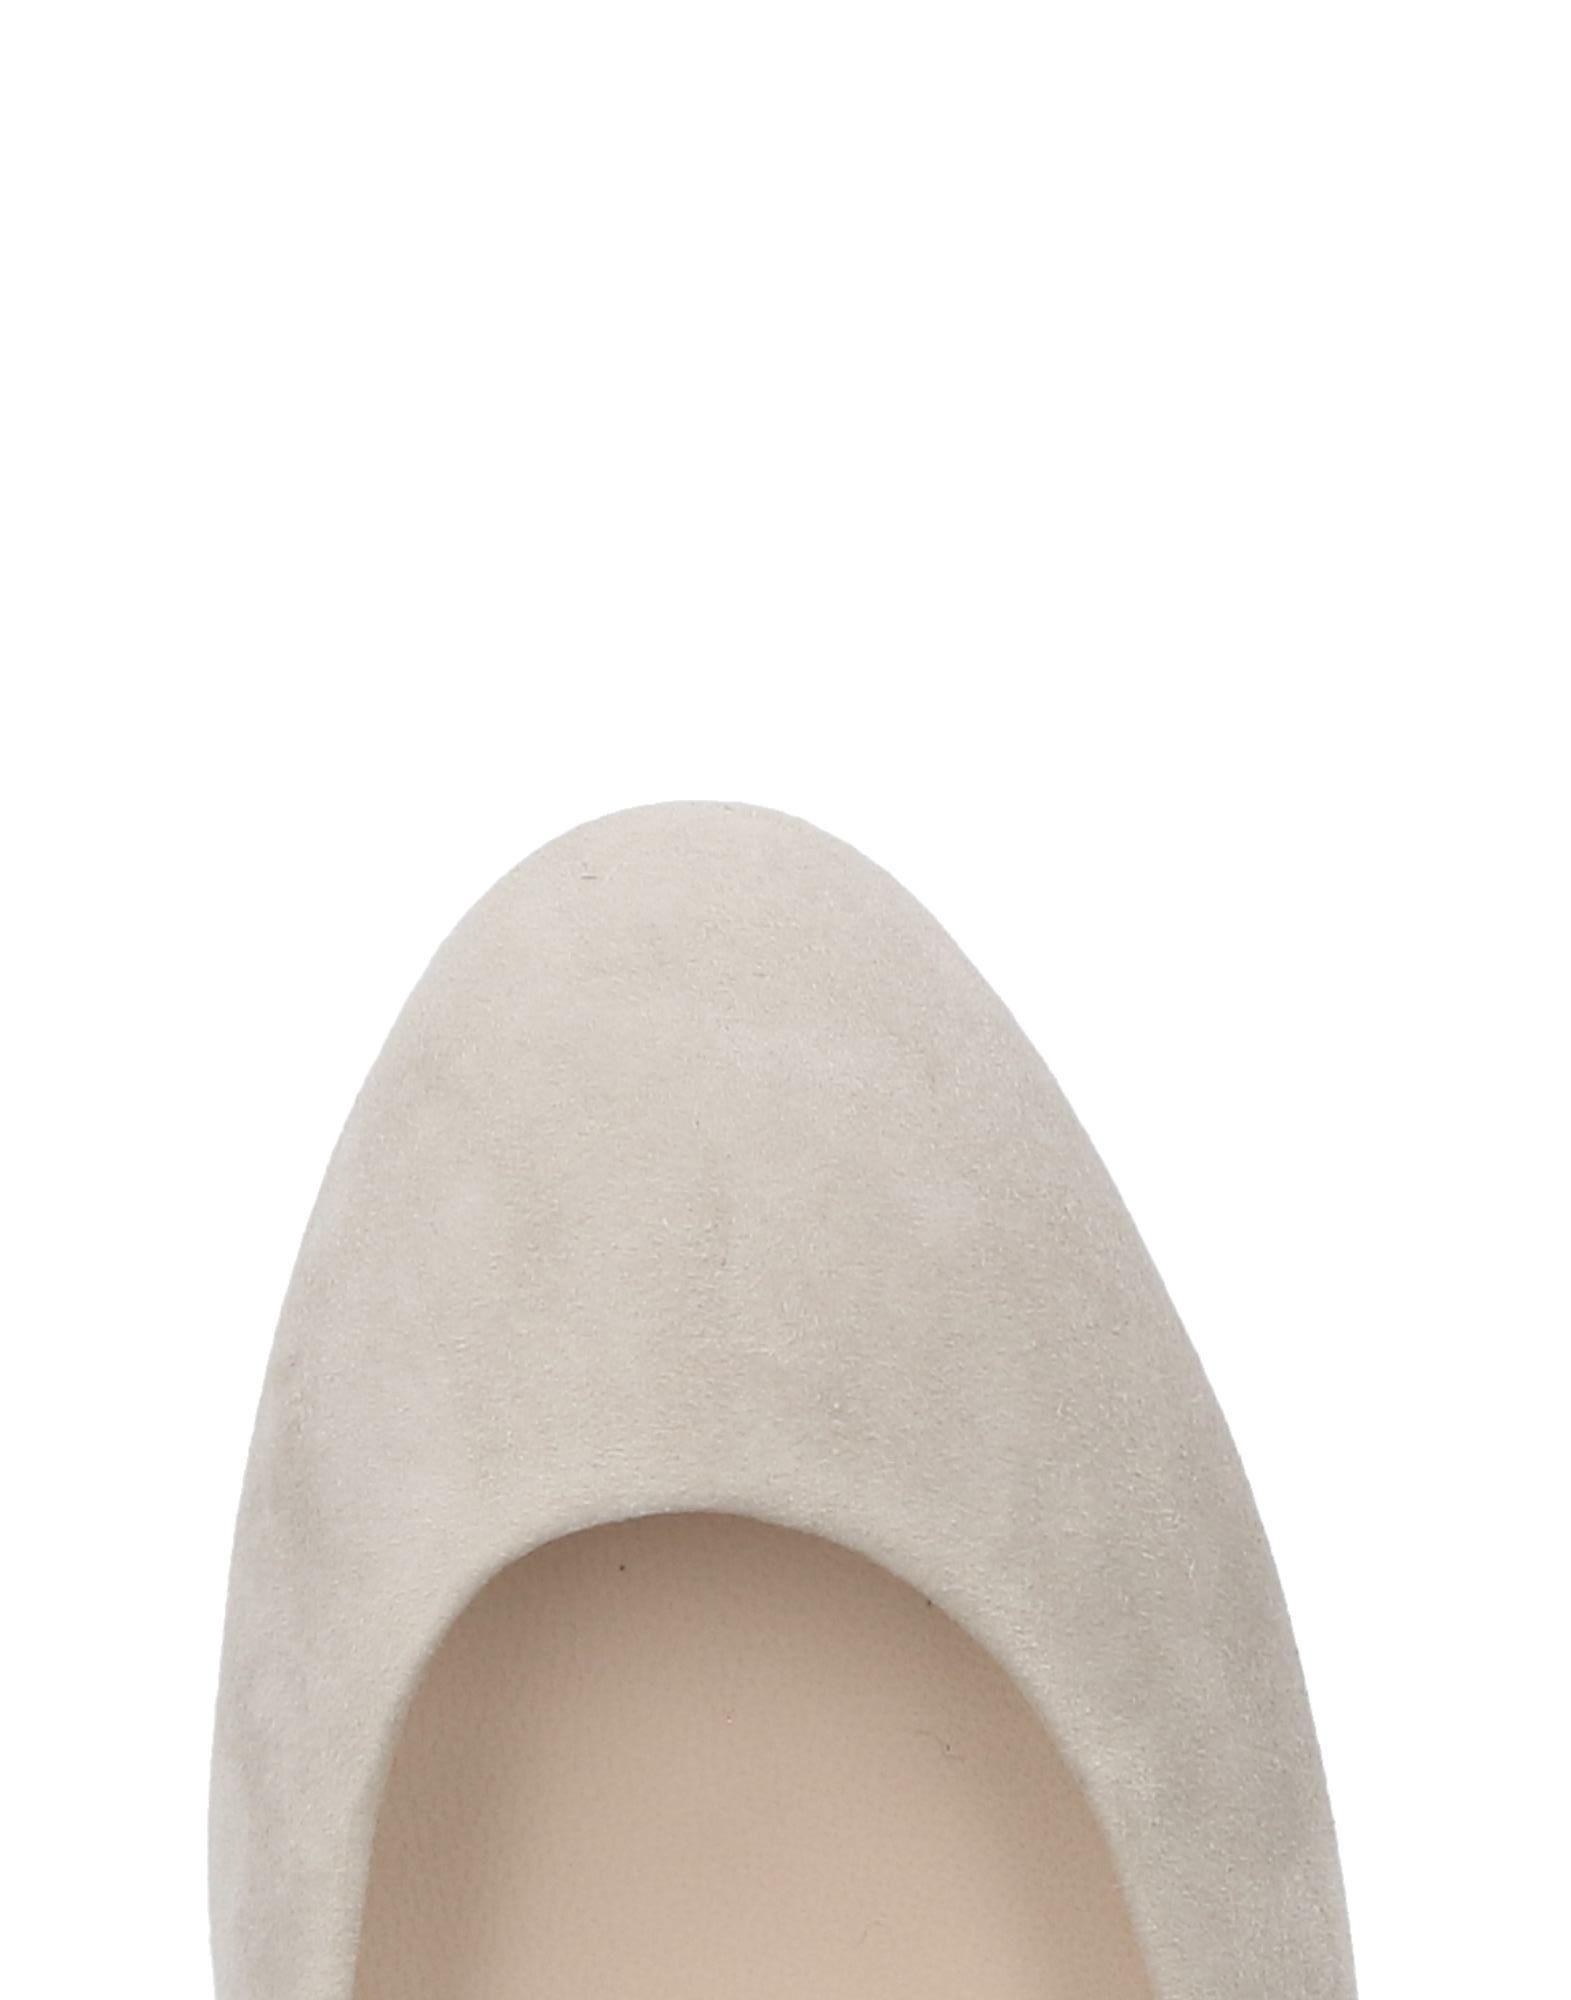 Stilvolle billige Pumps Schuhe Voltan Pumps billige Damen  11472461RL 279c0e